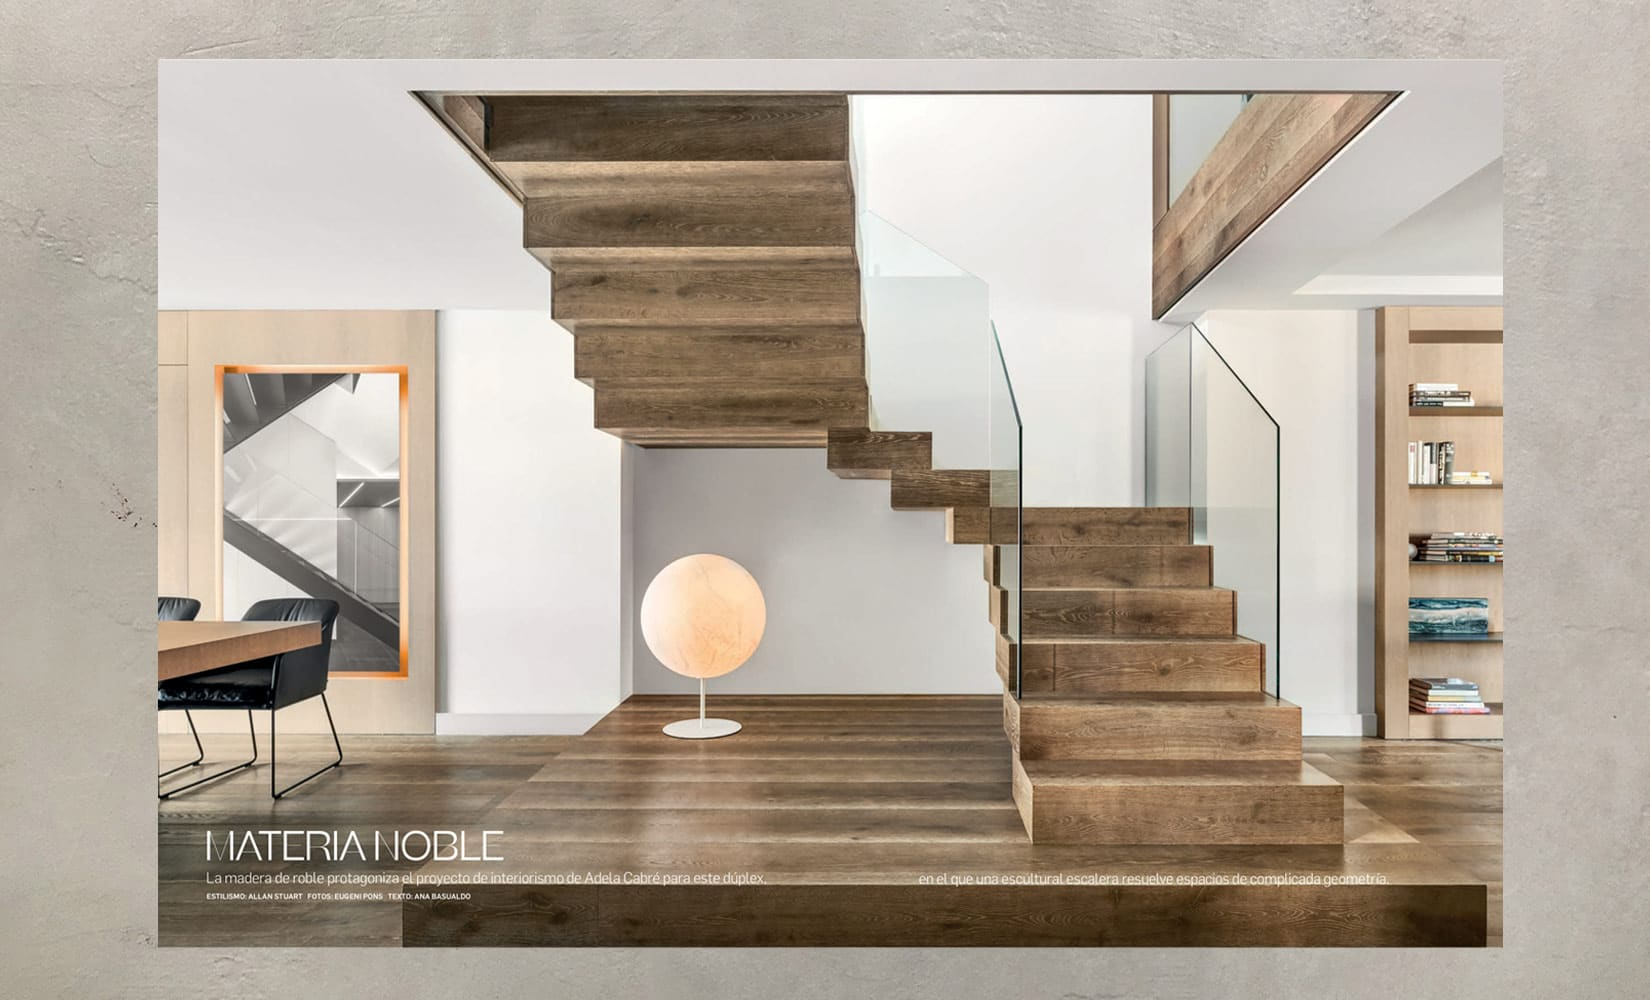 https://www.adelacabre.com/wp-content/uploads/2020/12/arquitectura-y-diseno-junio-2019-01.jpg